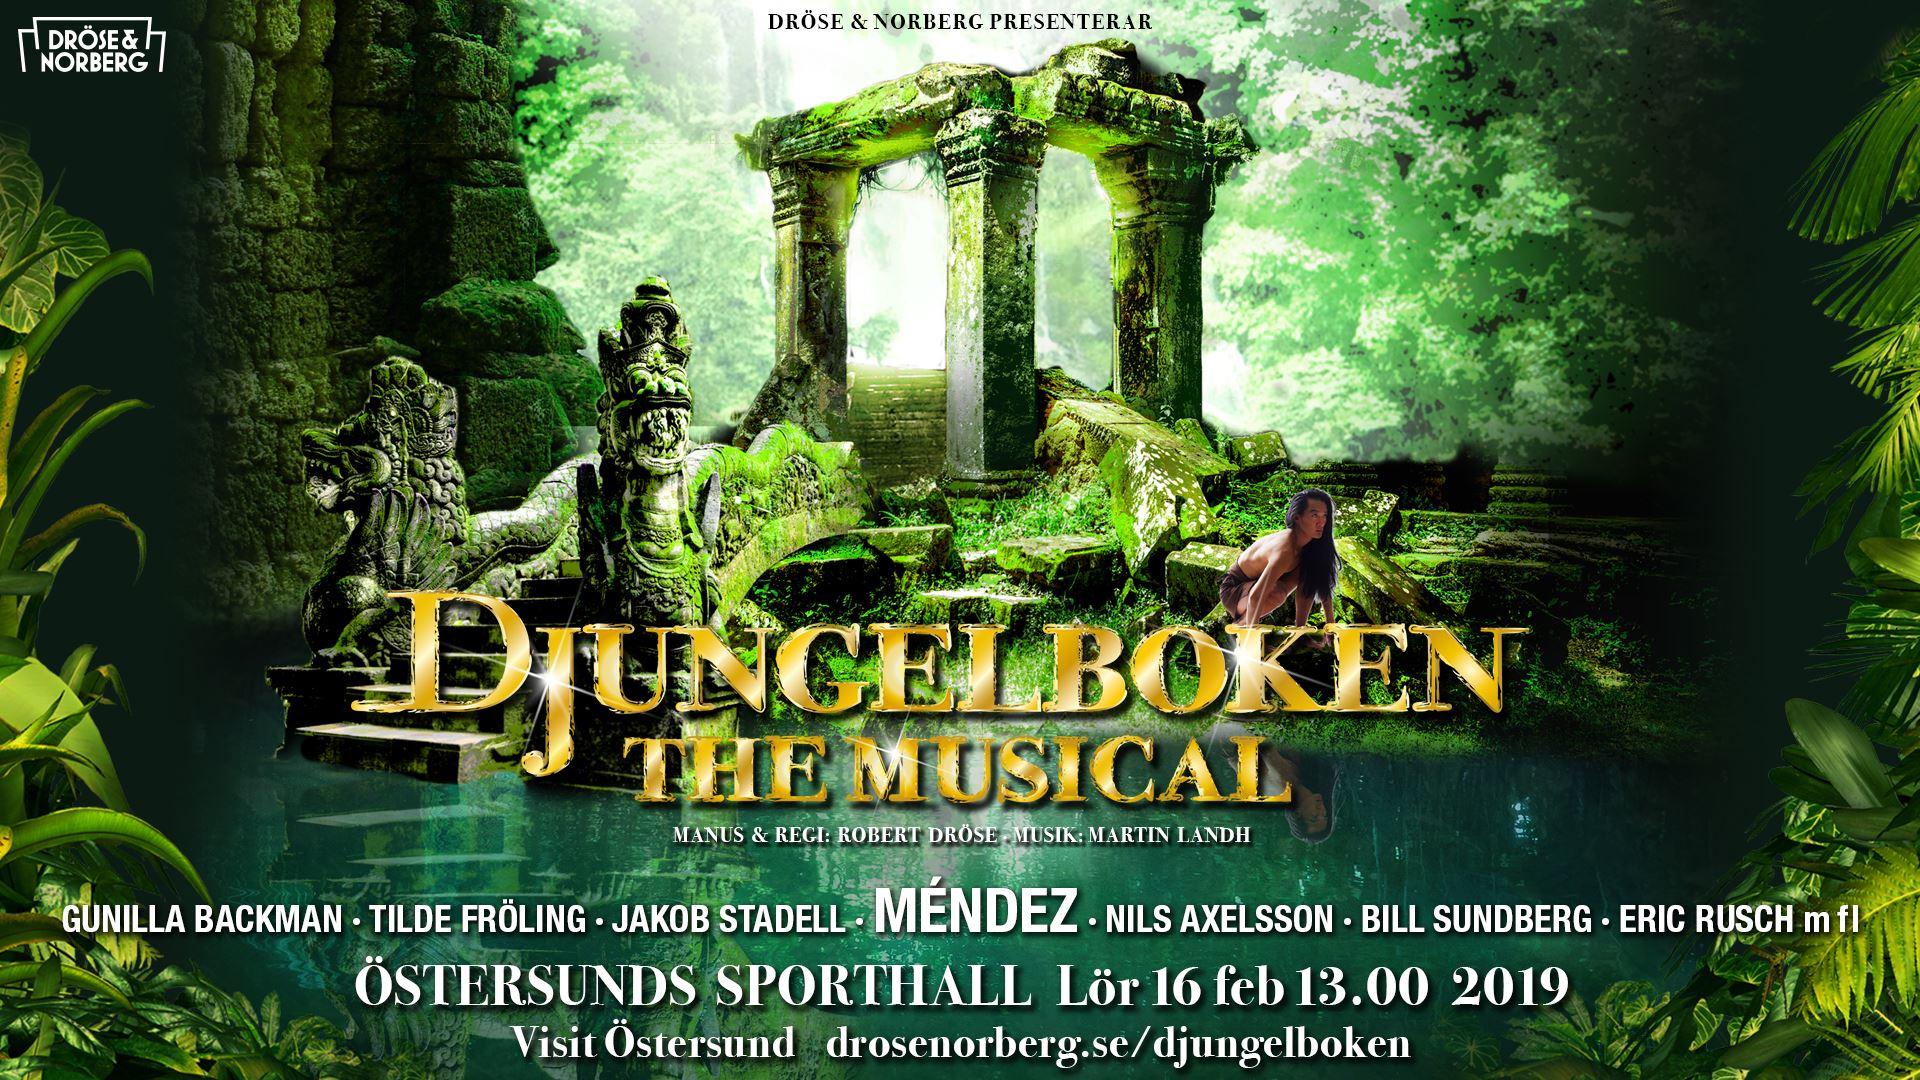 Foto: Dröse & Norberg,  © Copy: Dröse & Norberg, Djungelboken The Musical